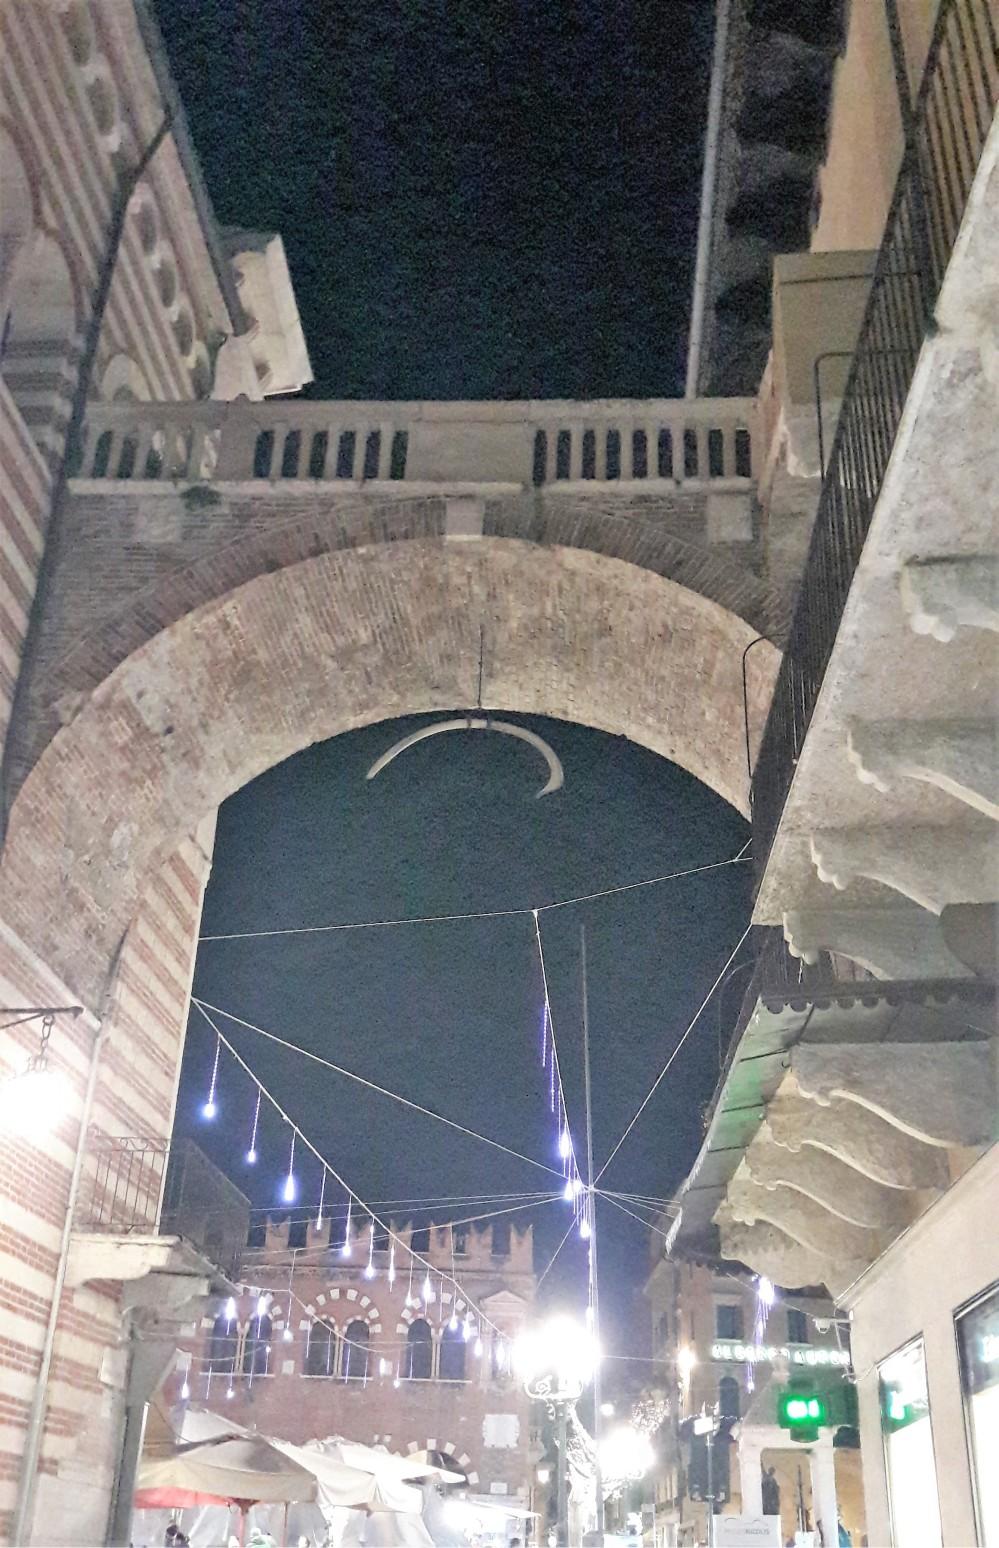 hueso ballena Verona.jpg